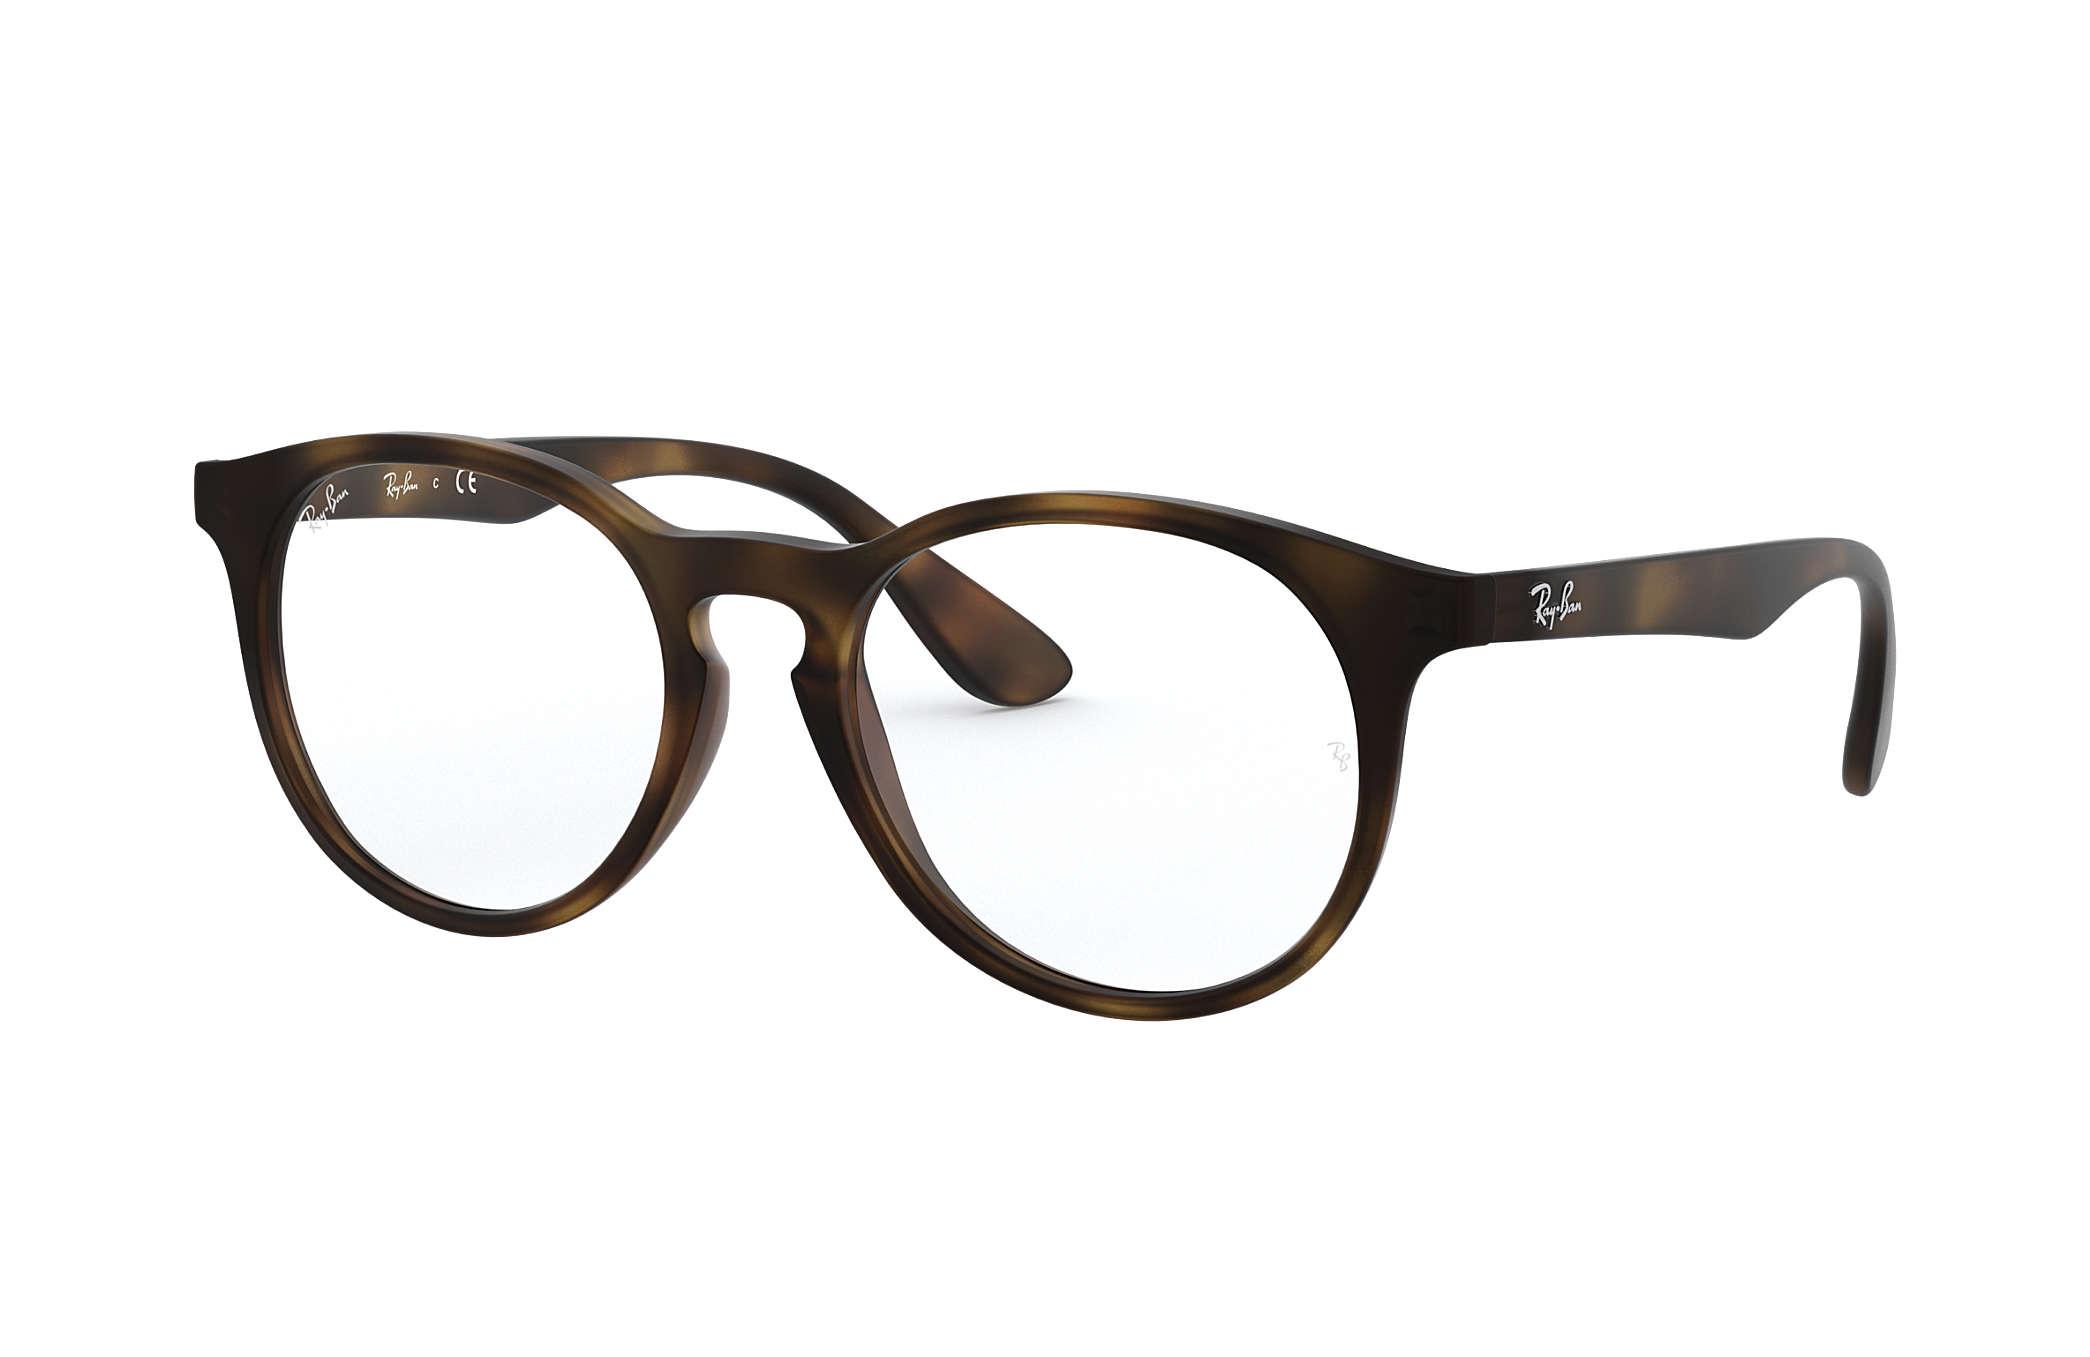 ray ban lunette de vue 2017 argoat. Black Bedroom Furniture Sets. Home Design Ideas